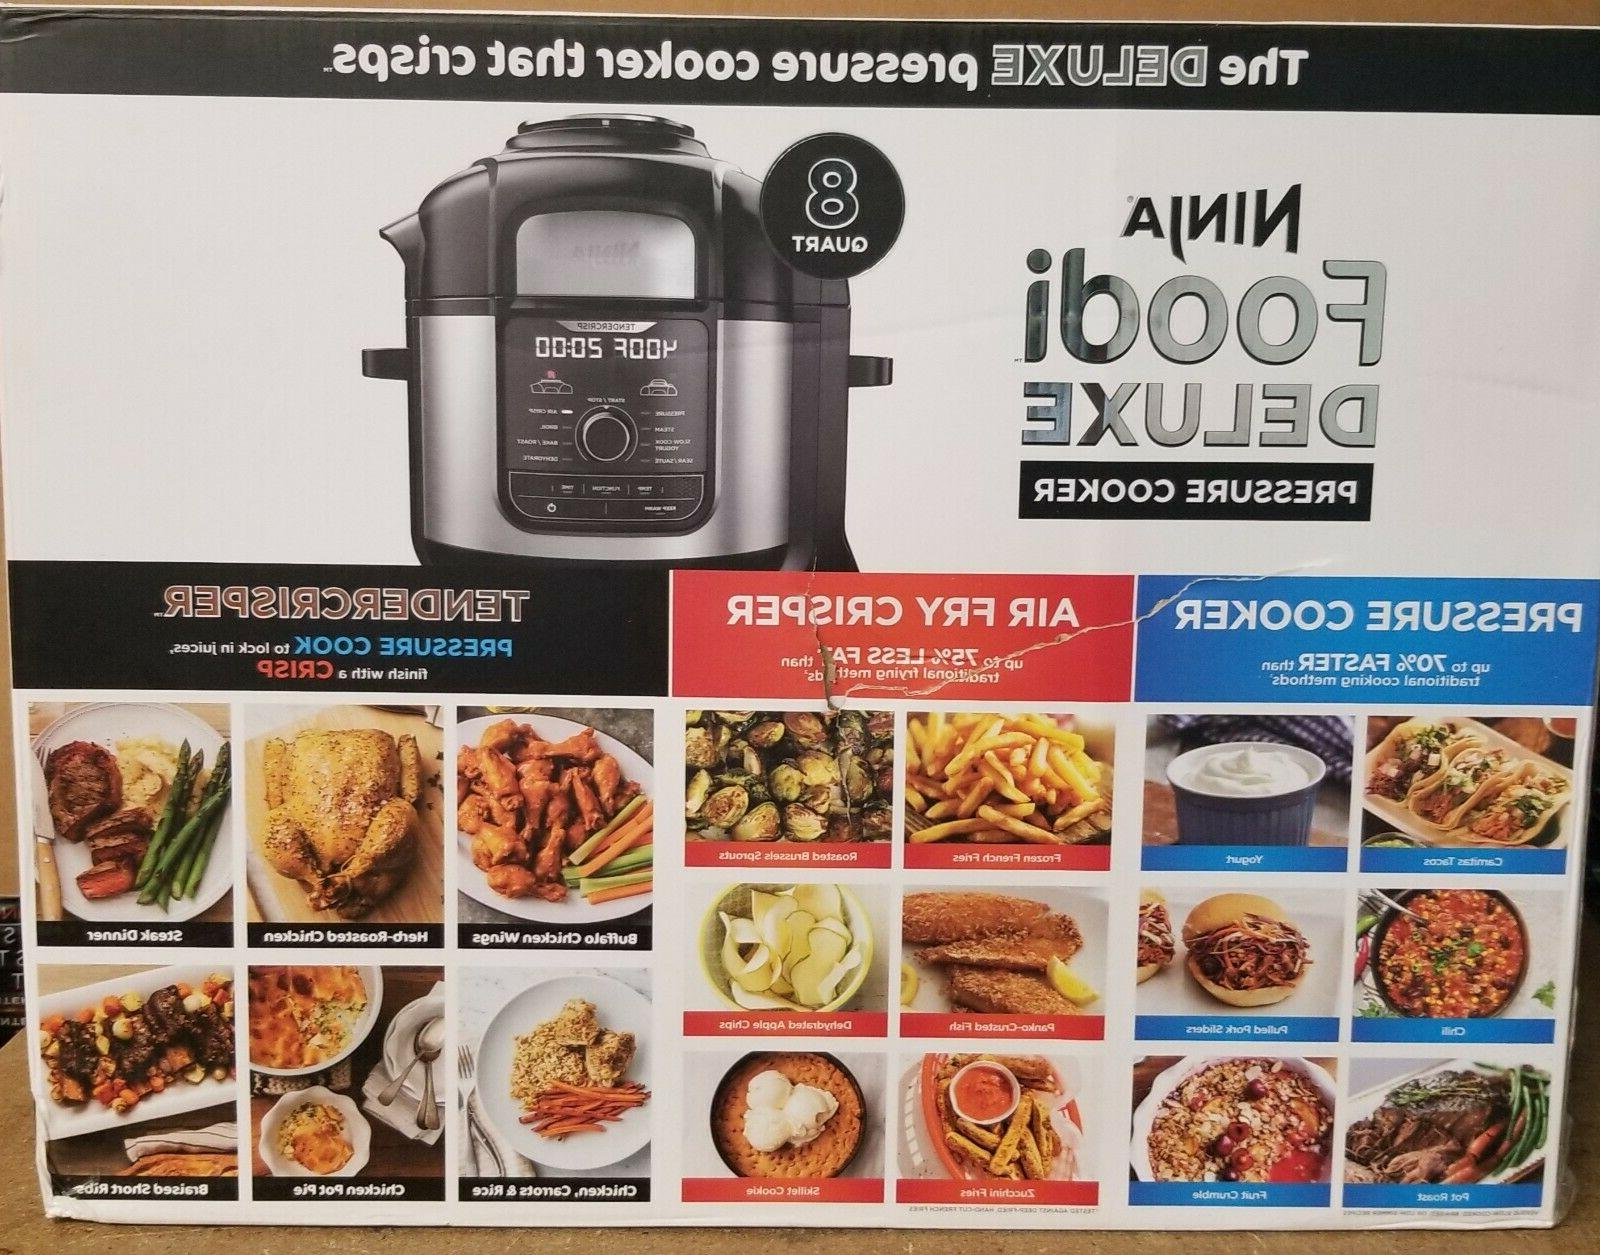 NEW Ninja Foodi 9-in-1 Cooker & Fryer